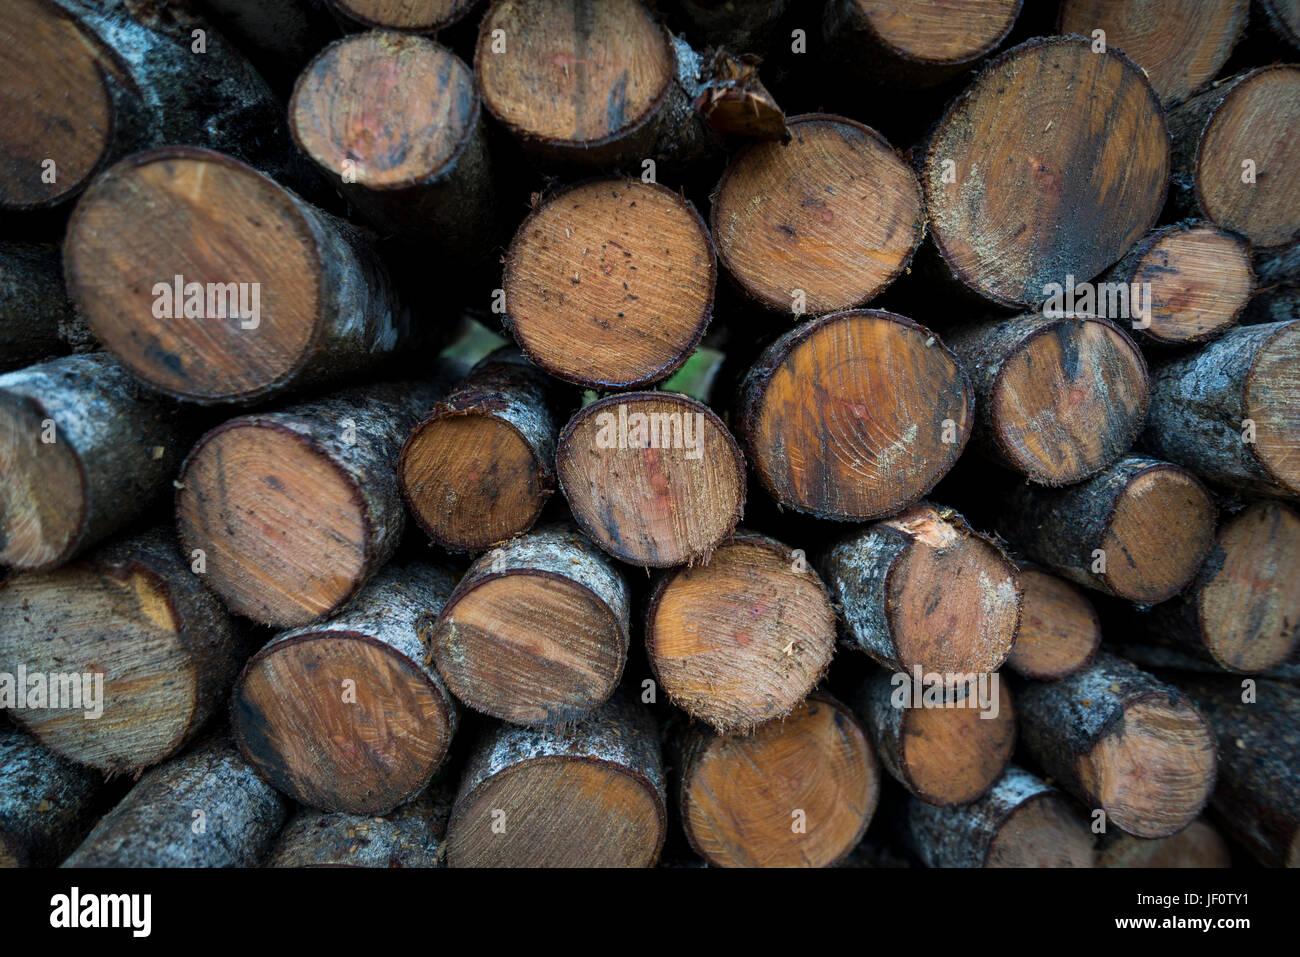 Leñadores del Sarao leñadores / Imagen De Stock